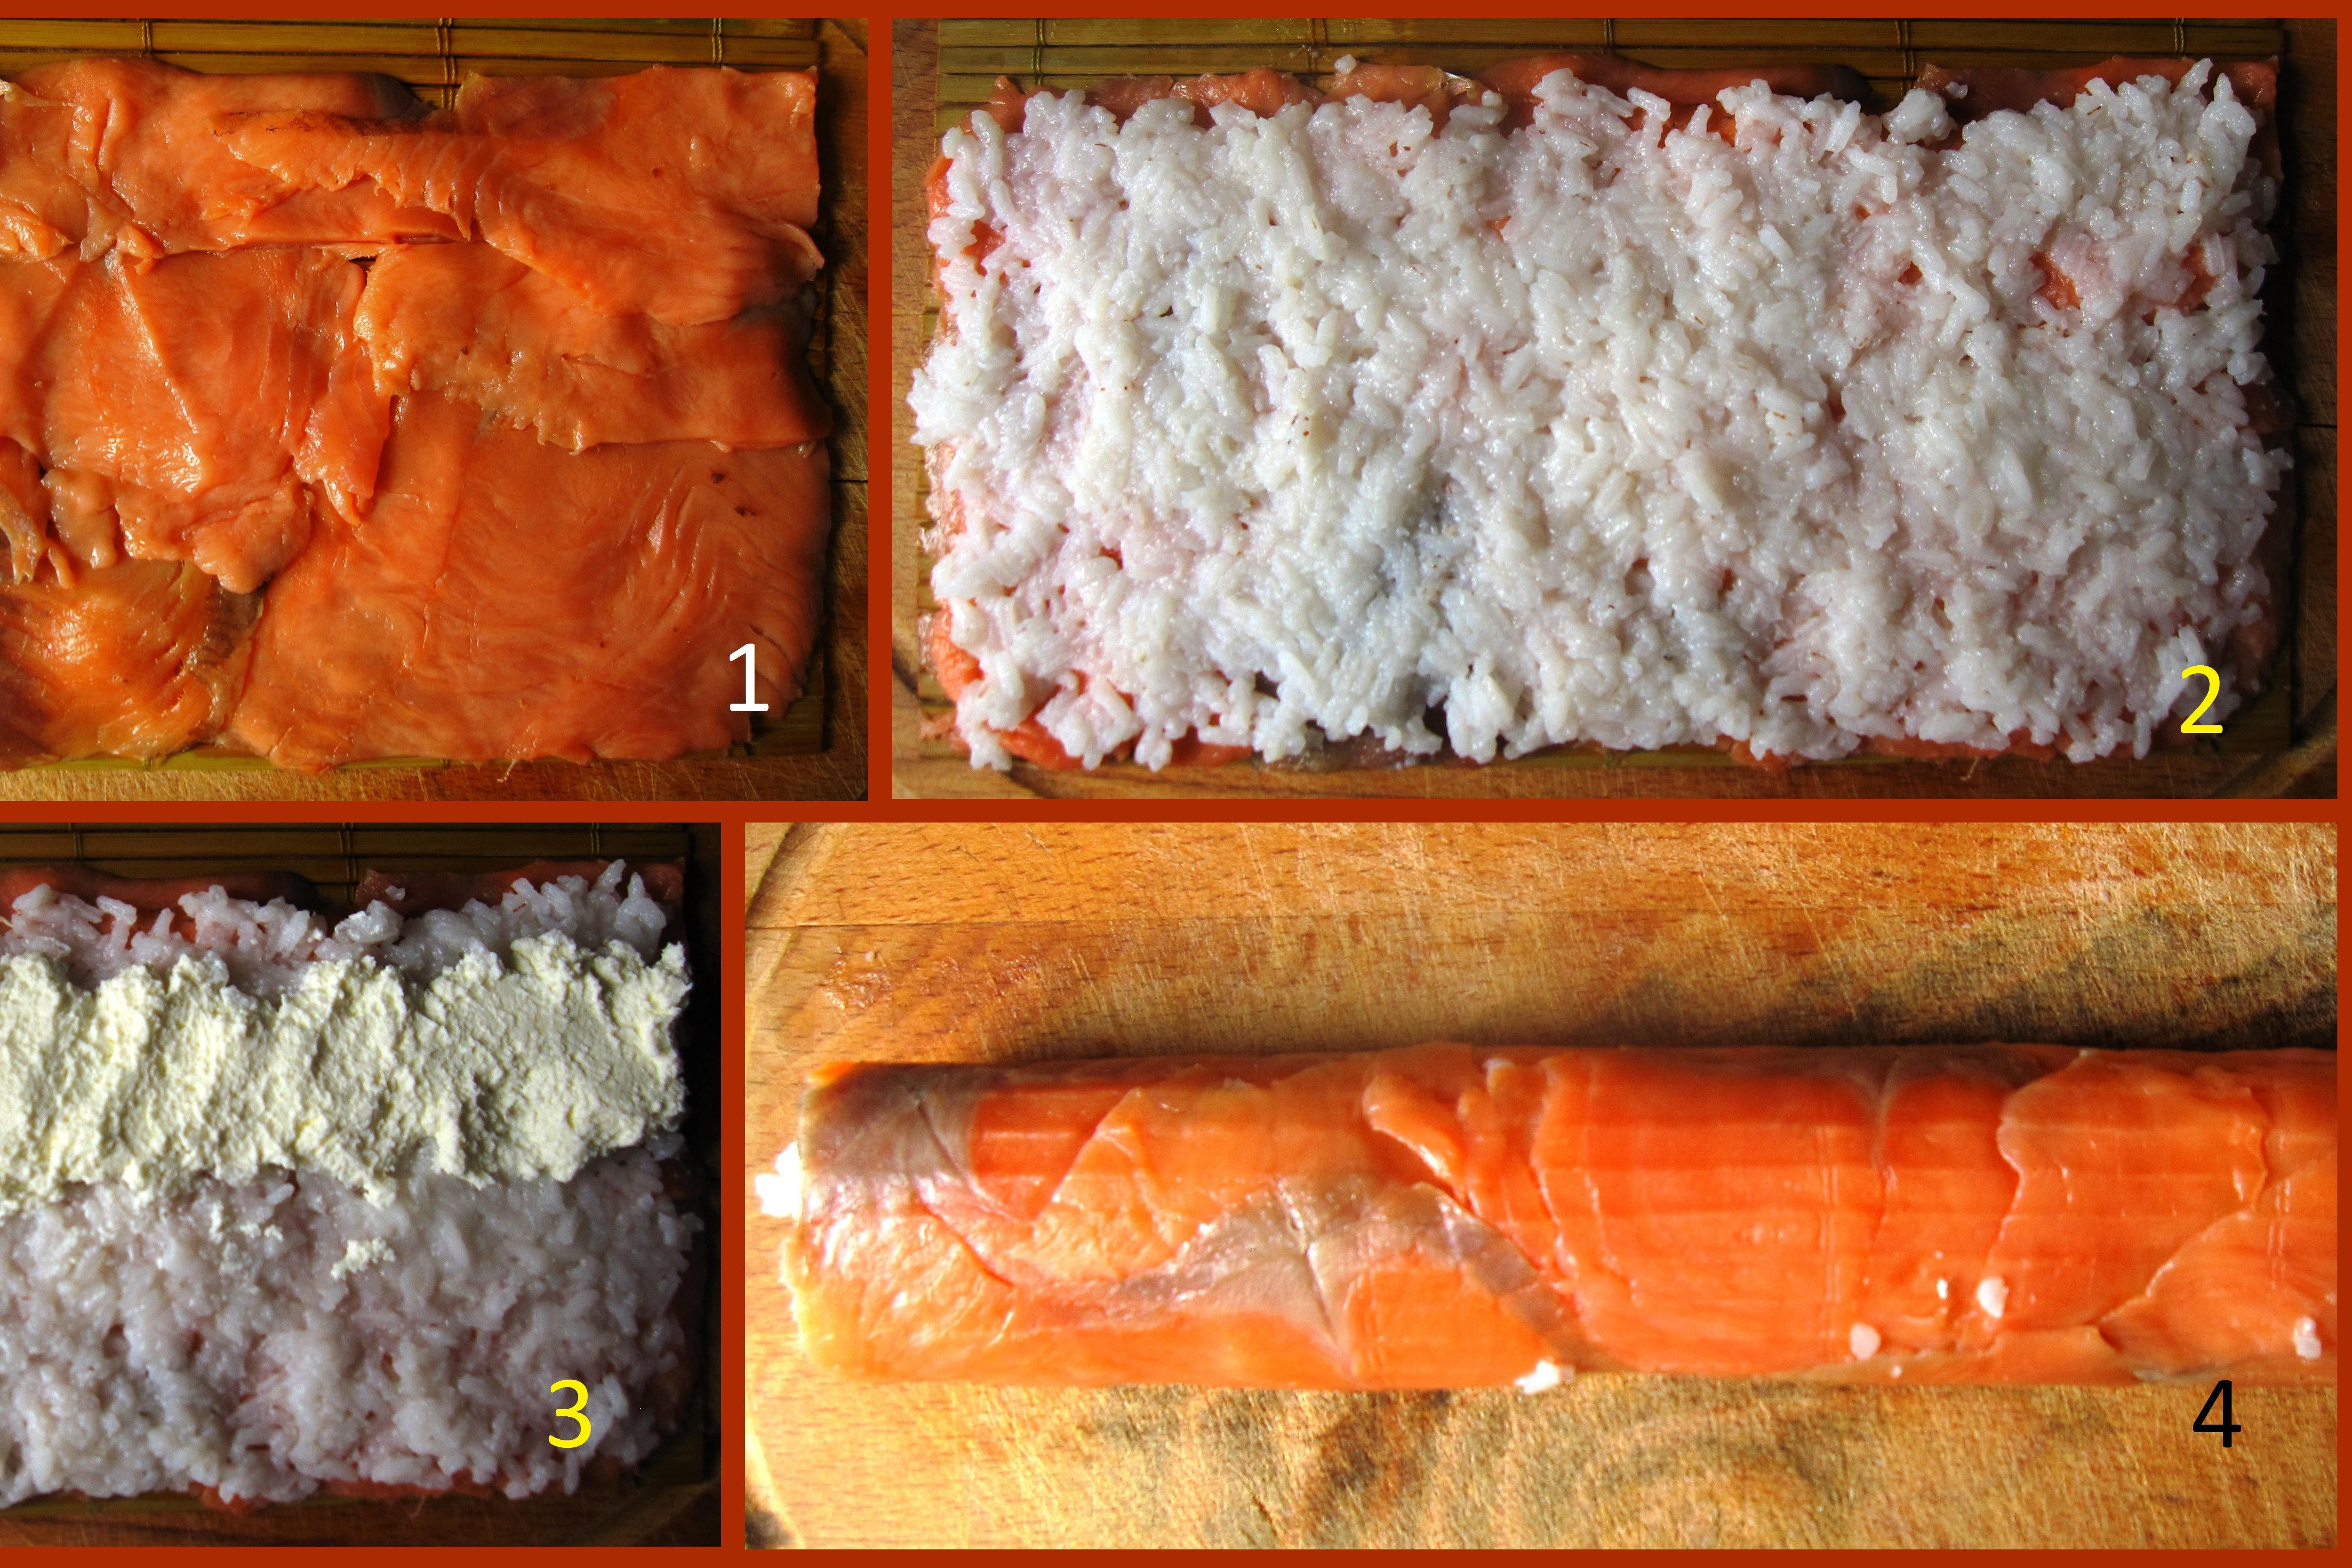 Рецепт суши филадельфия домашних условиях пошагово с фото